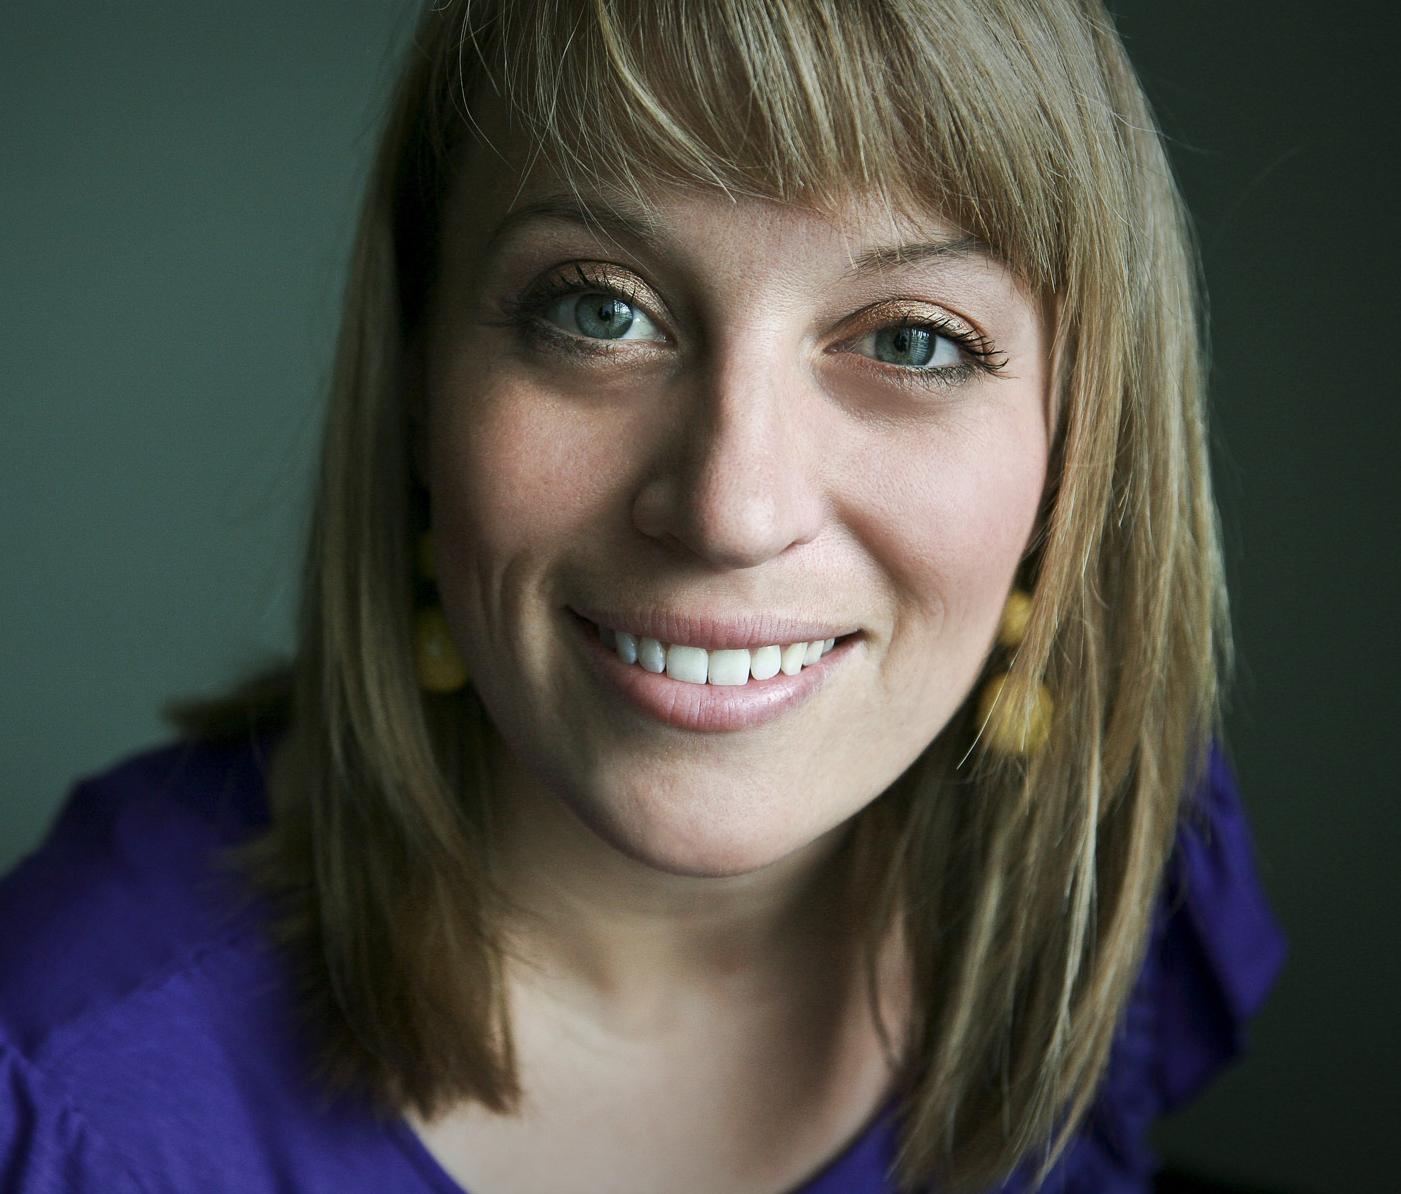 Emily Burford Headshot - Emily Burford.jpg